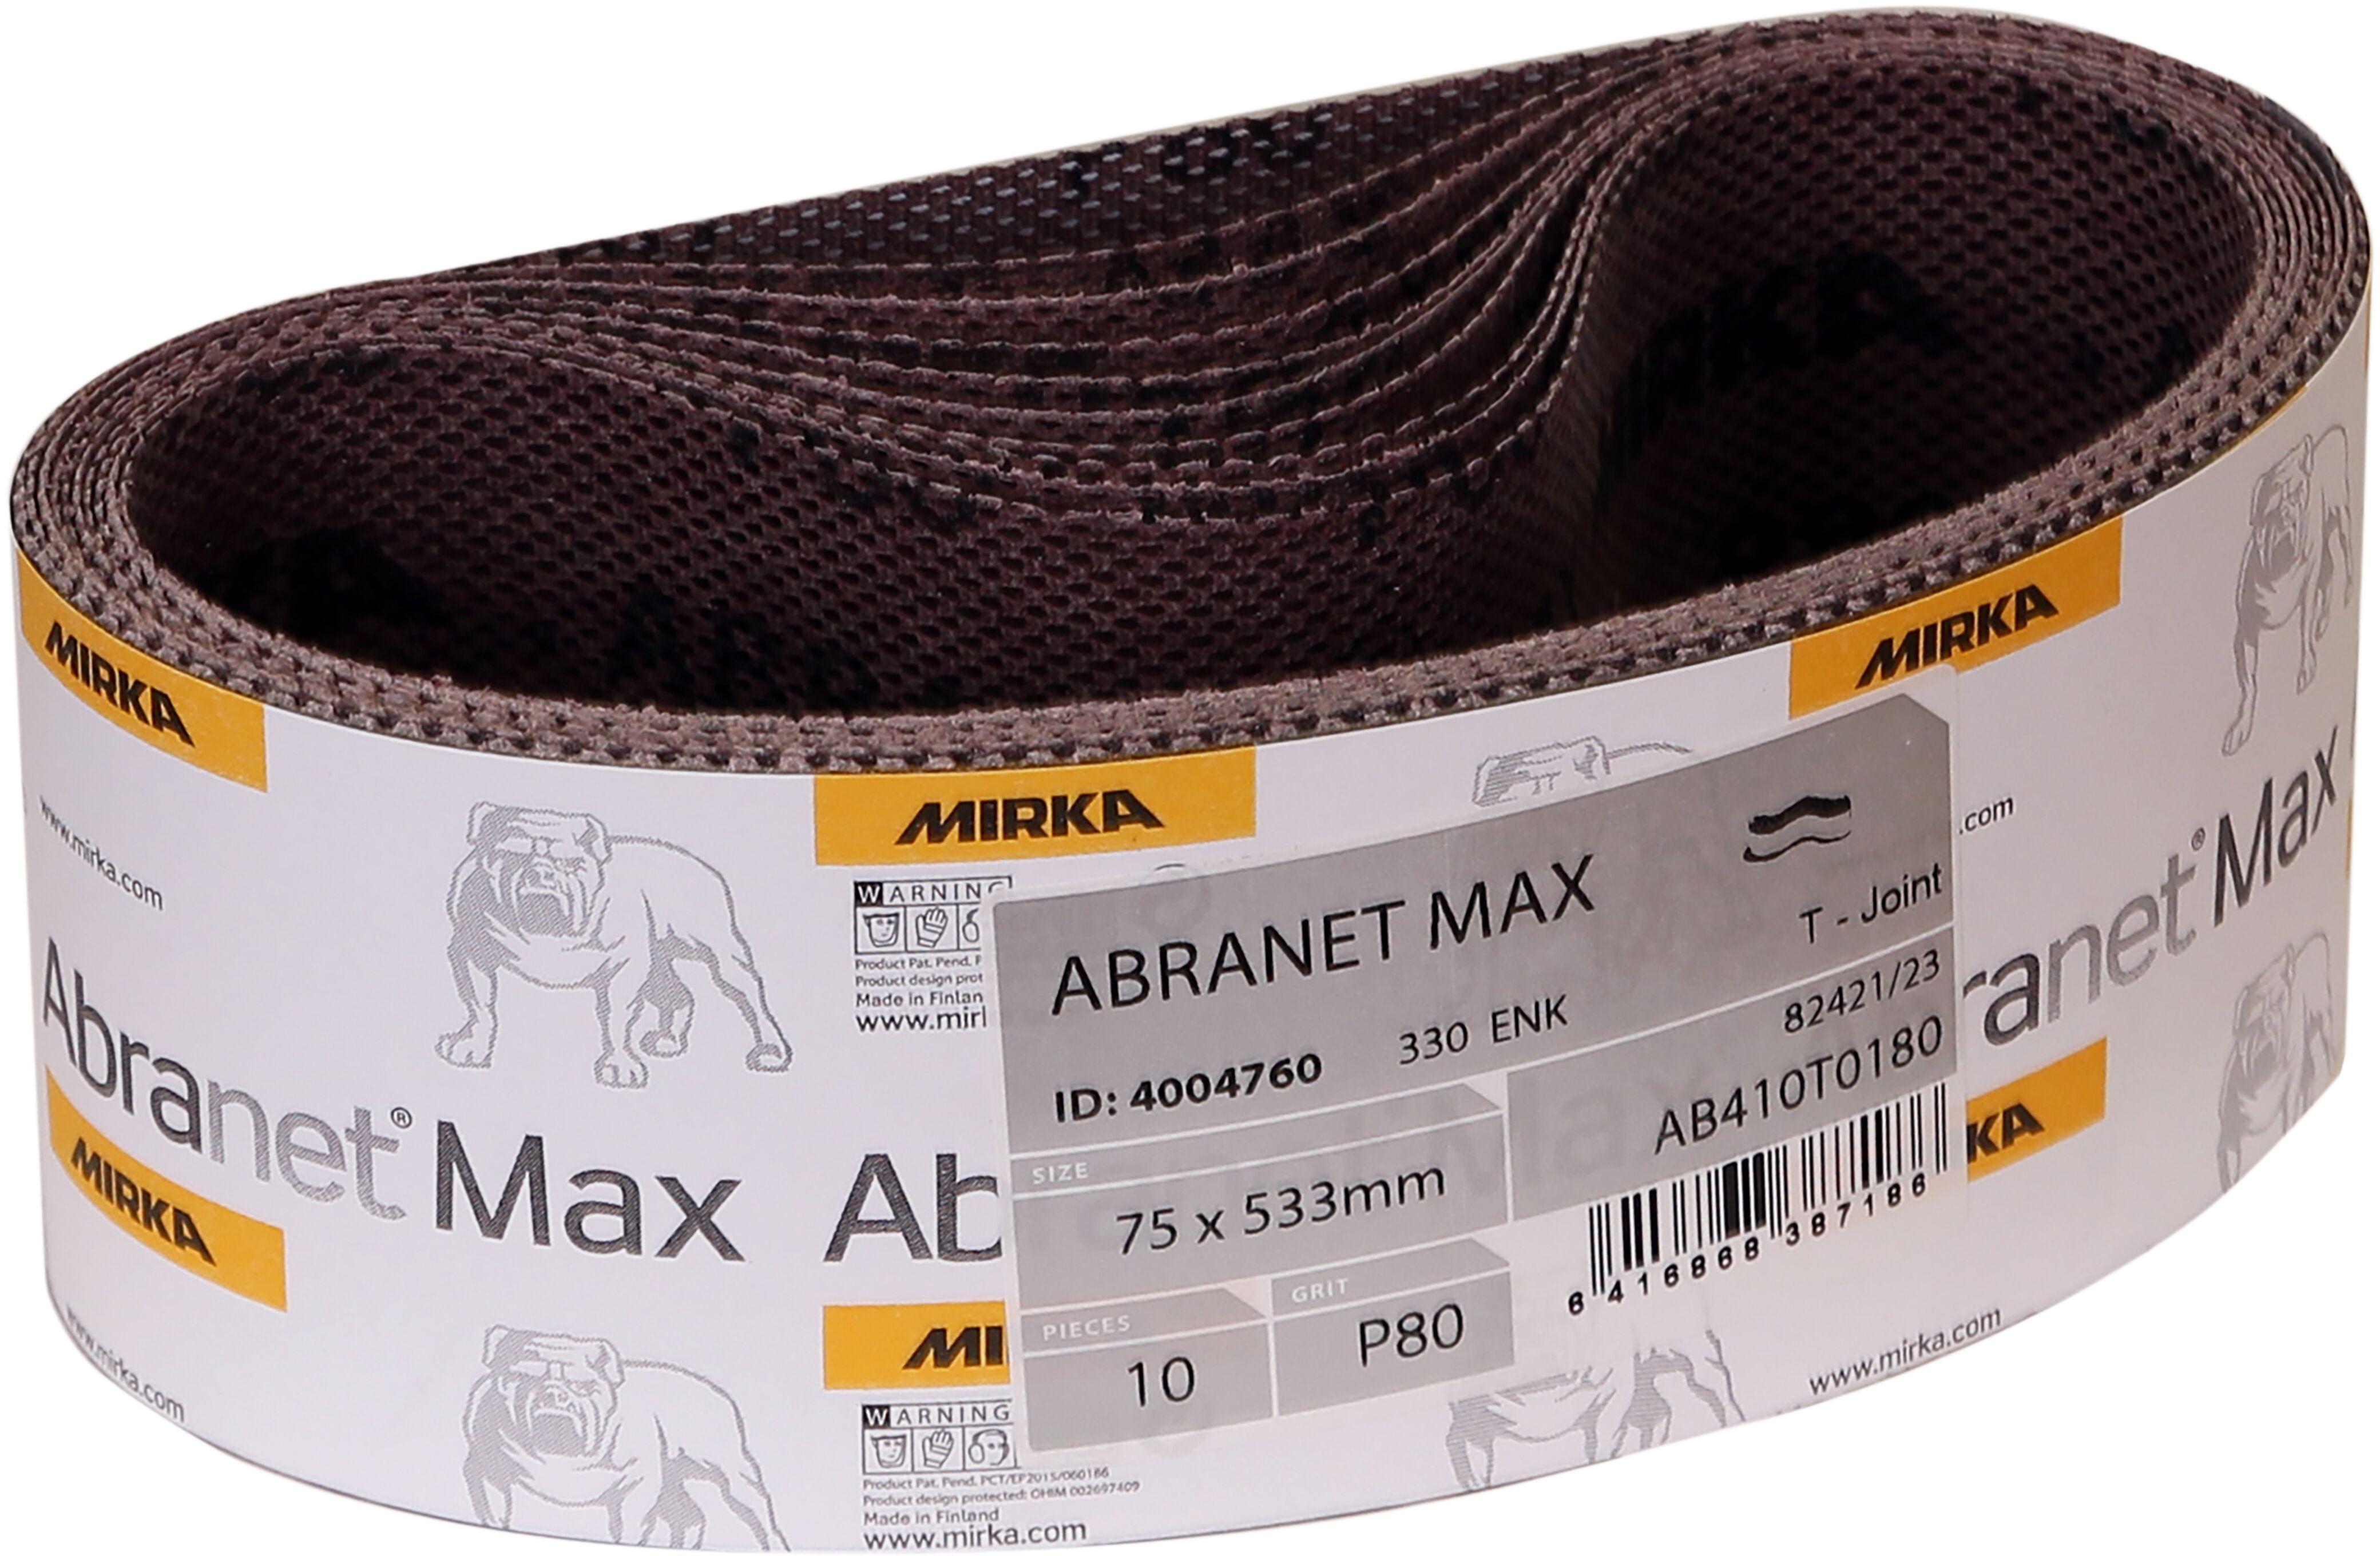 Mirka AB-3-21-080T 80 Grit Abranet MAX Portable Abrasive Belt